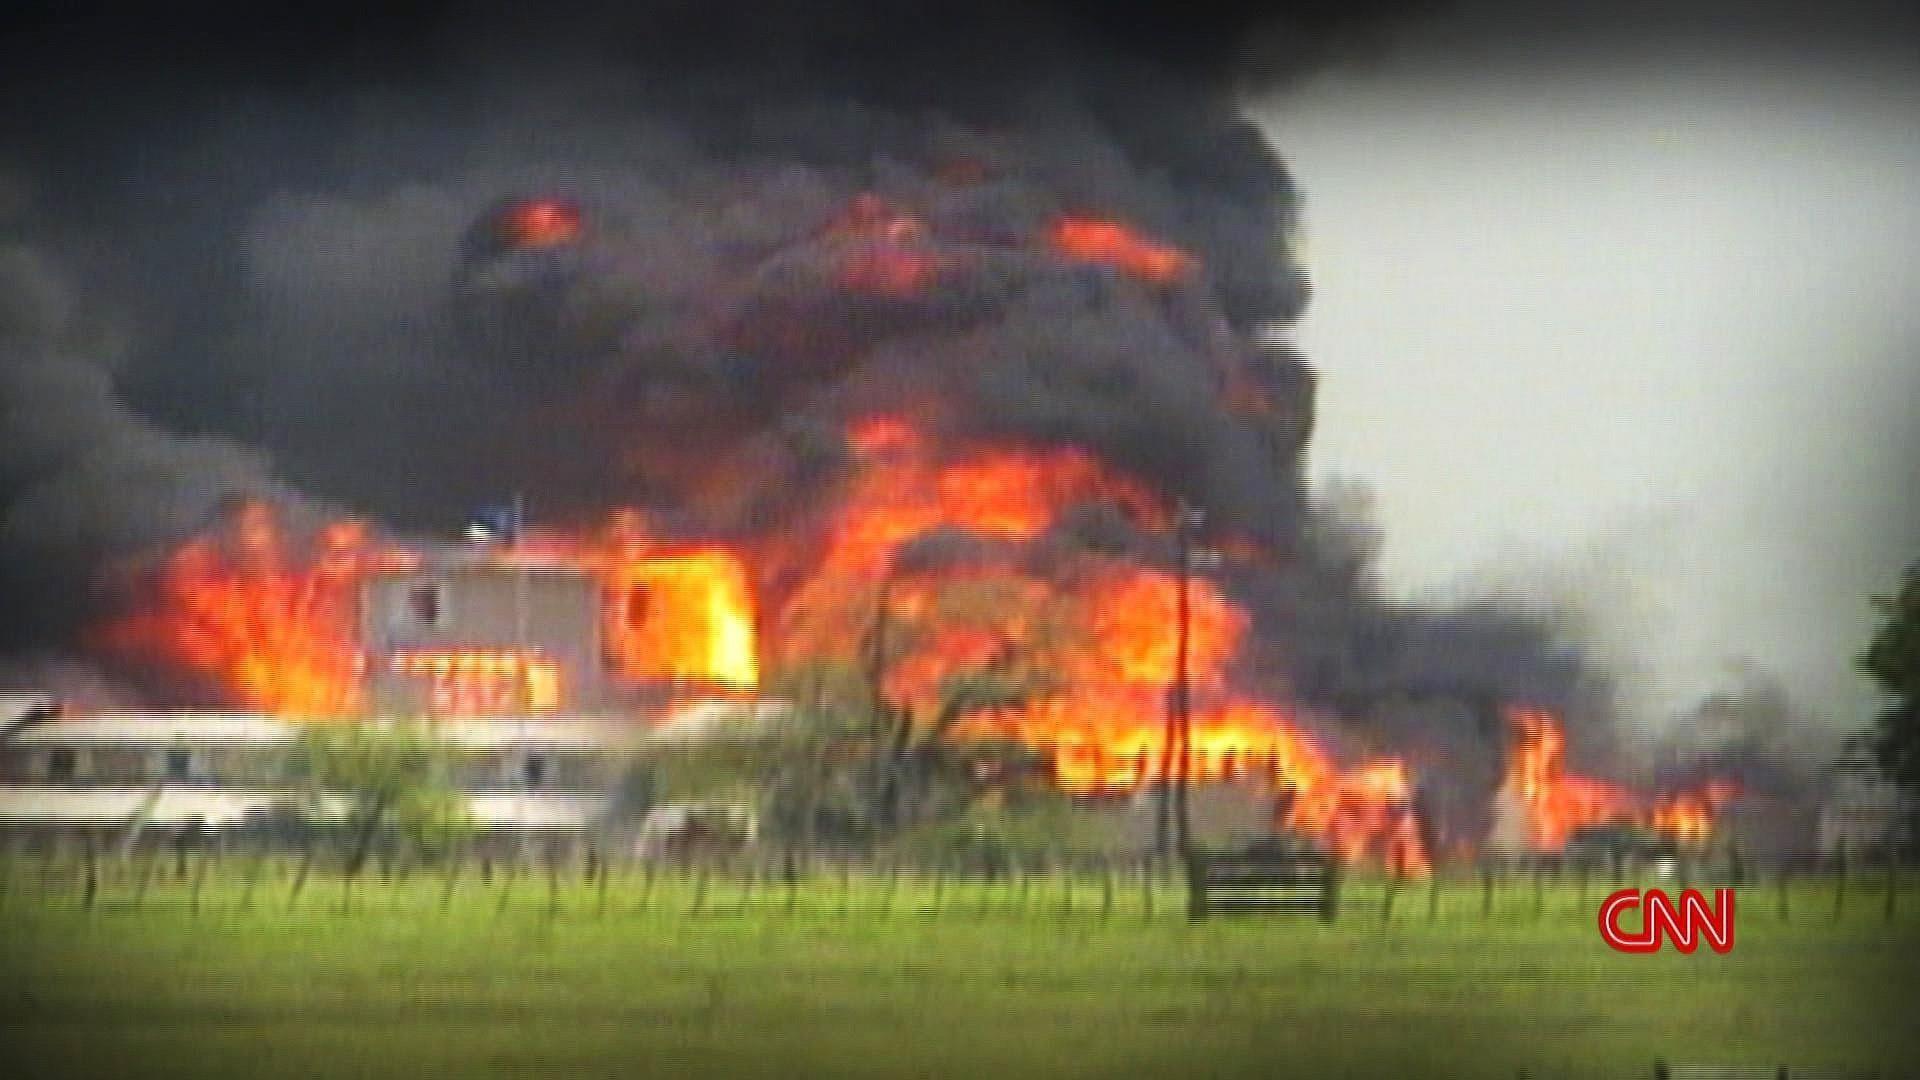 La tragédie de Waco